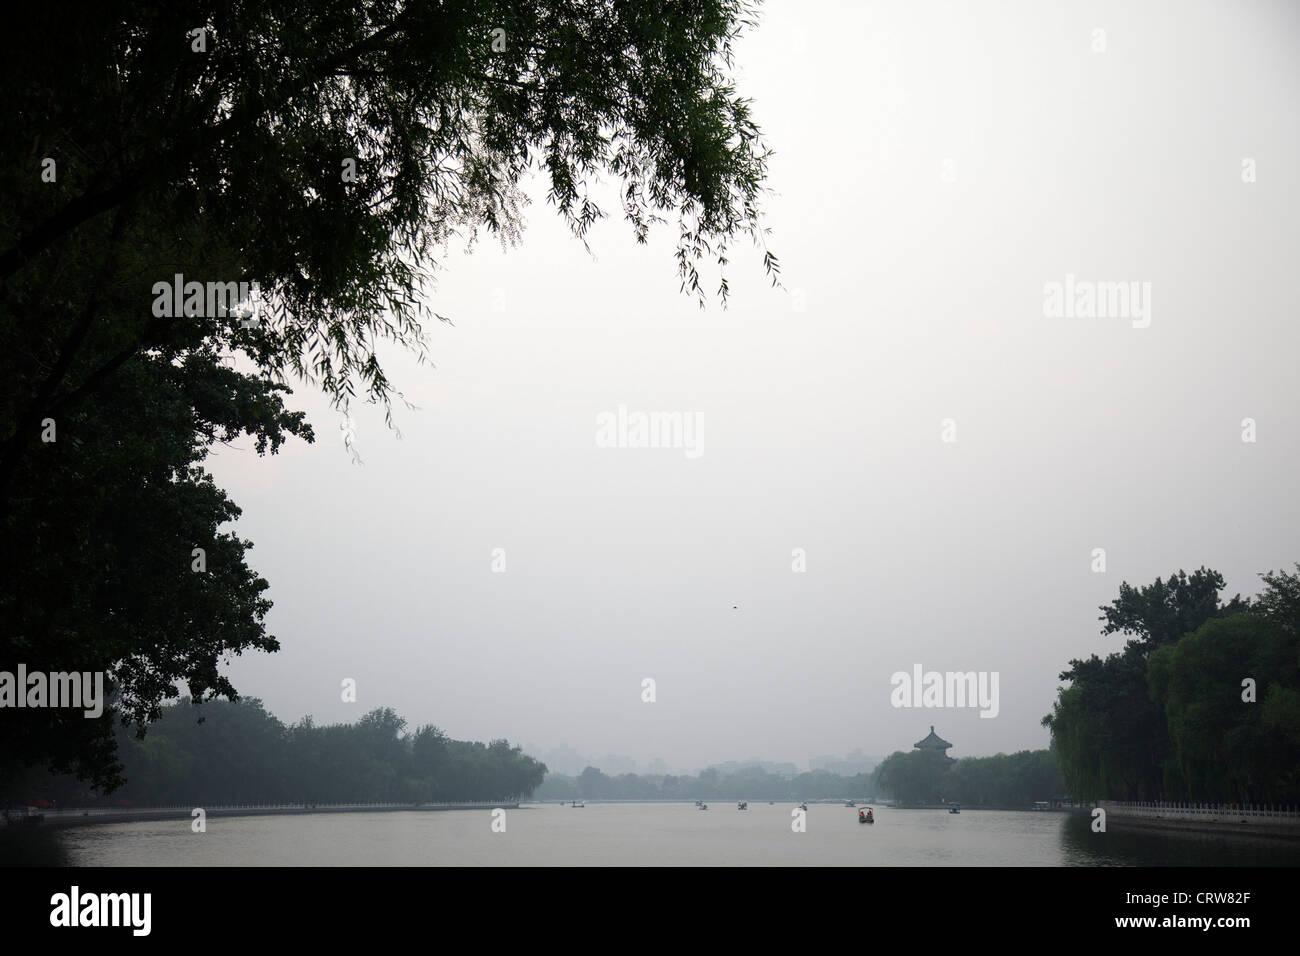 Shichahai lake at sunset, Beijing, China. Stock Photo